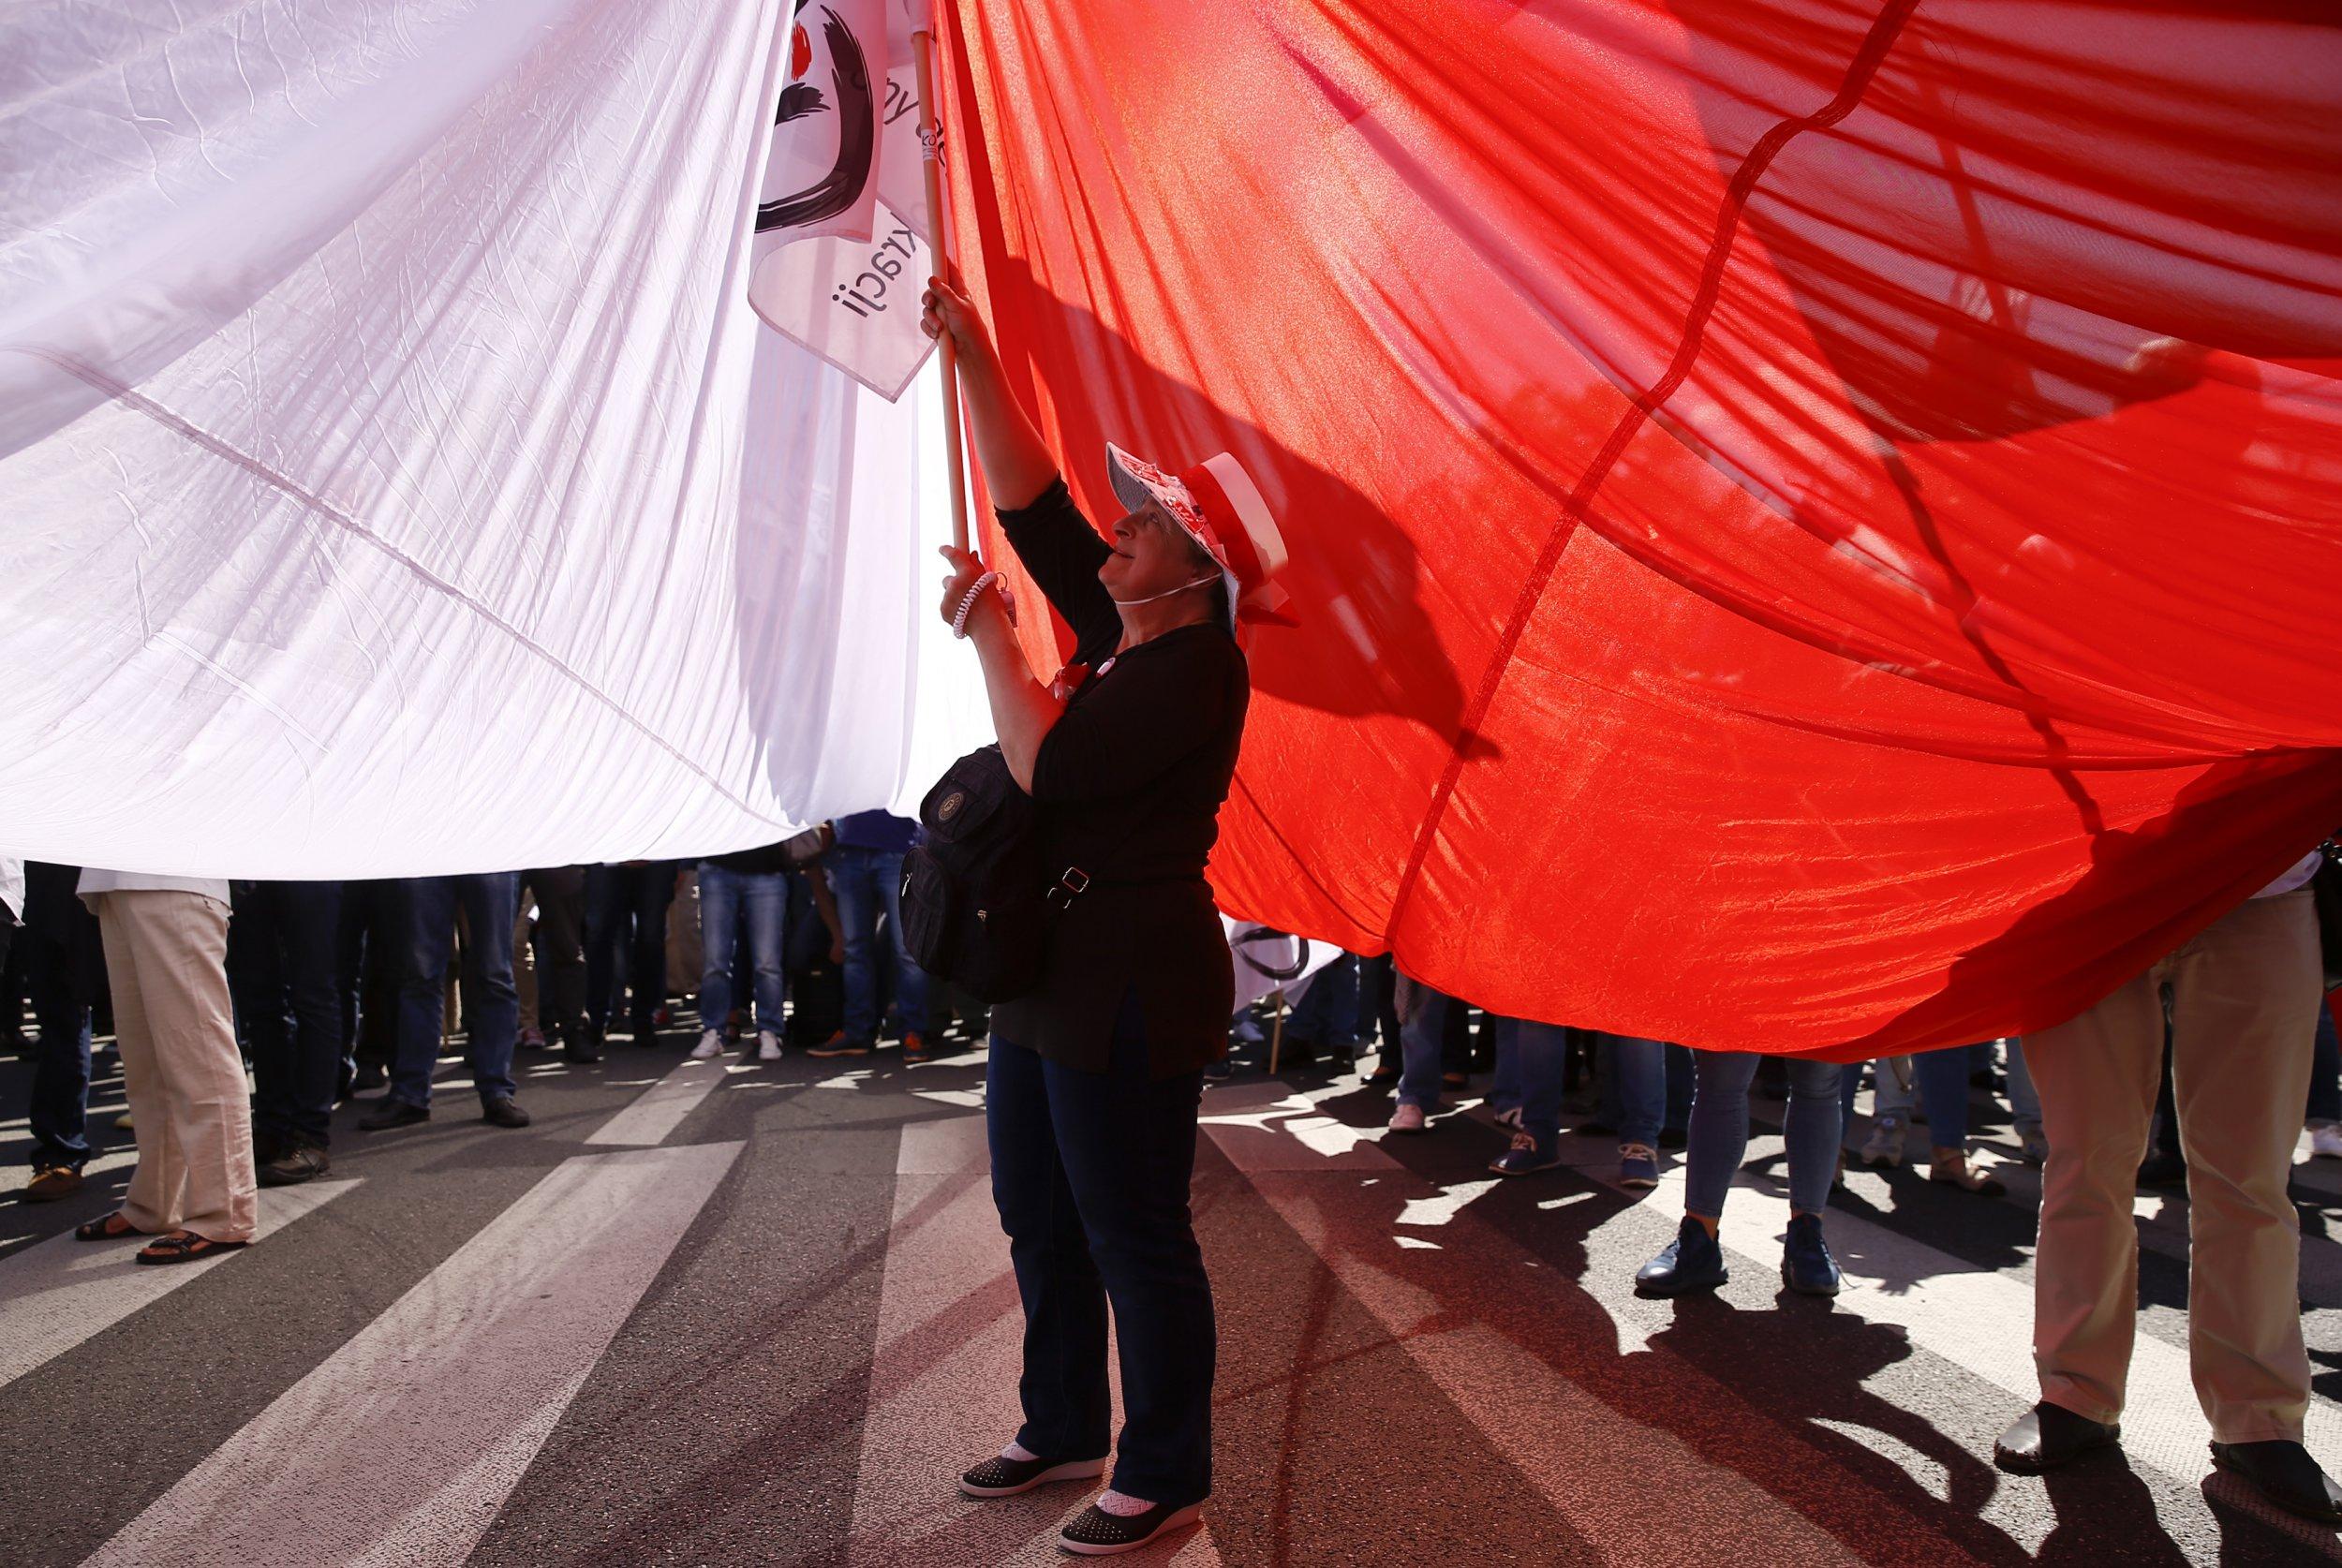 05_11_Poland_Oppression_01